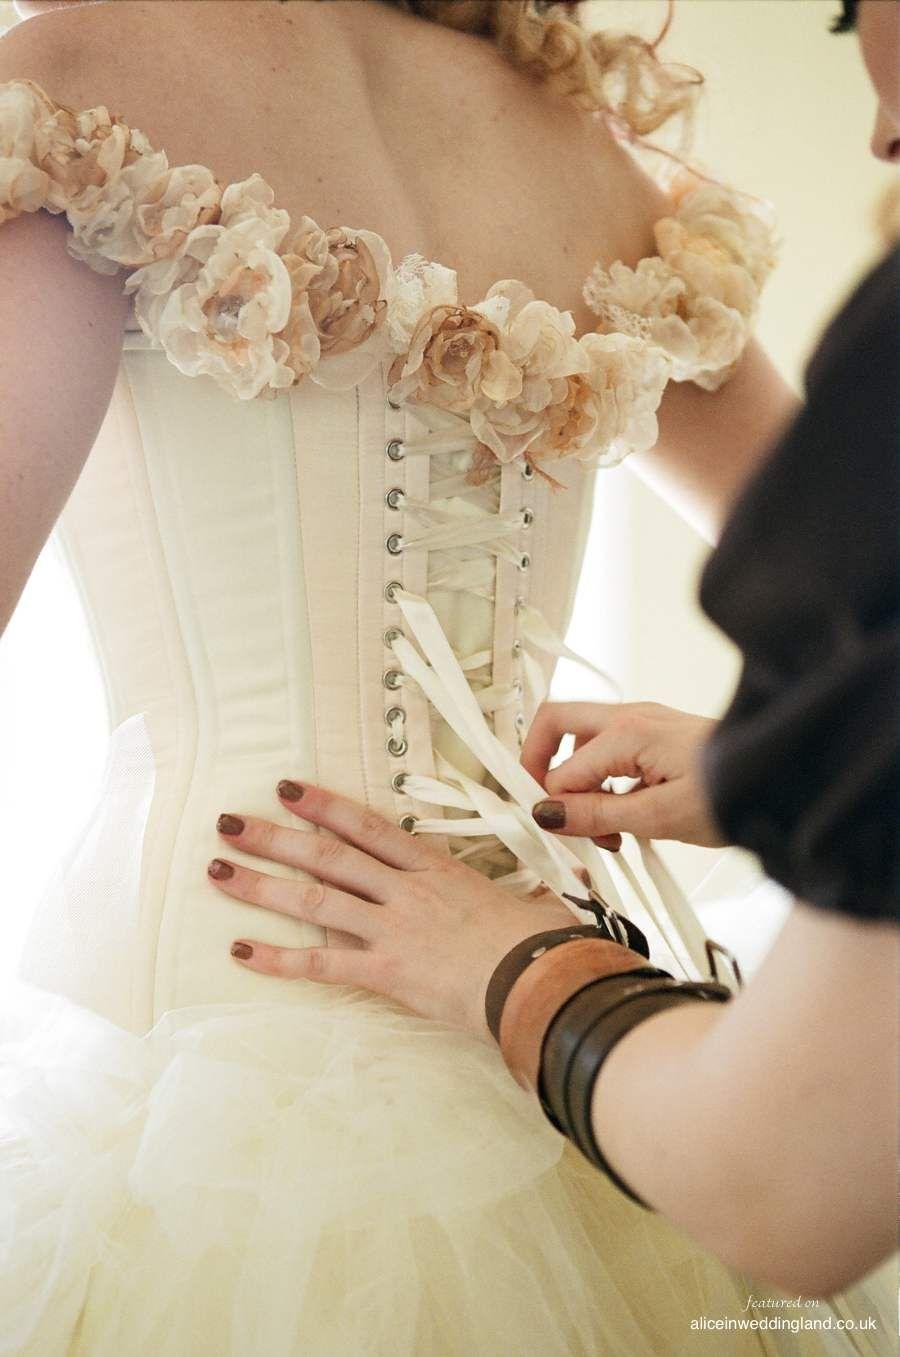 steampunk wedding dresses STEAMPUNK WEDDING GOWNS Alice in Weddingland Steampunk Wedding Steampunk Up Your Wedding